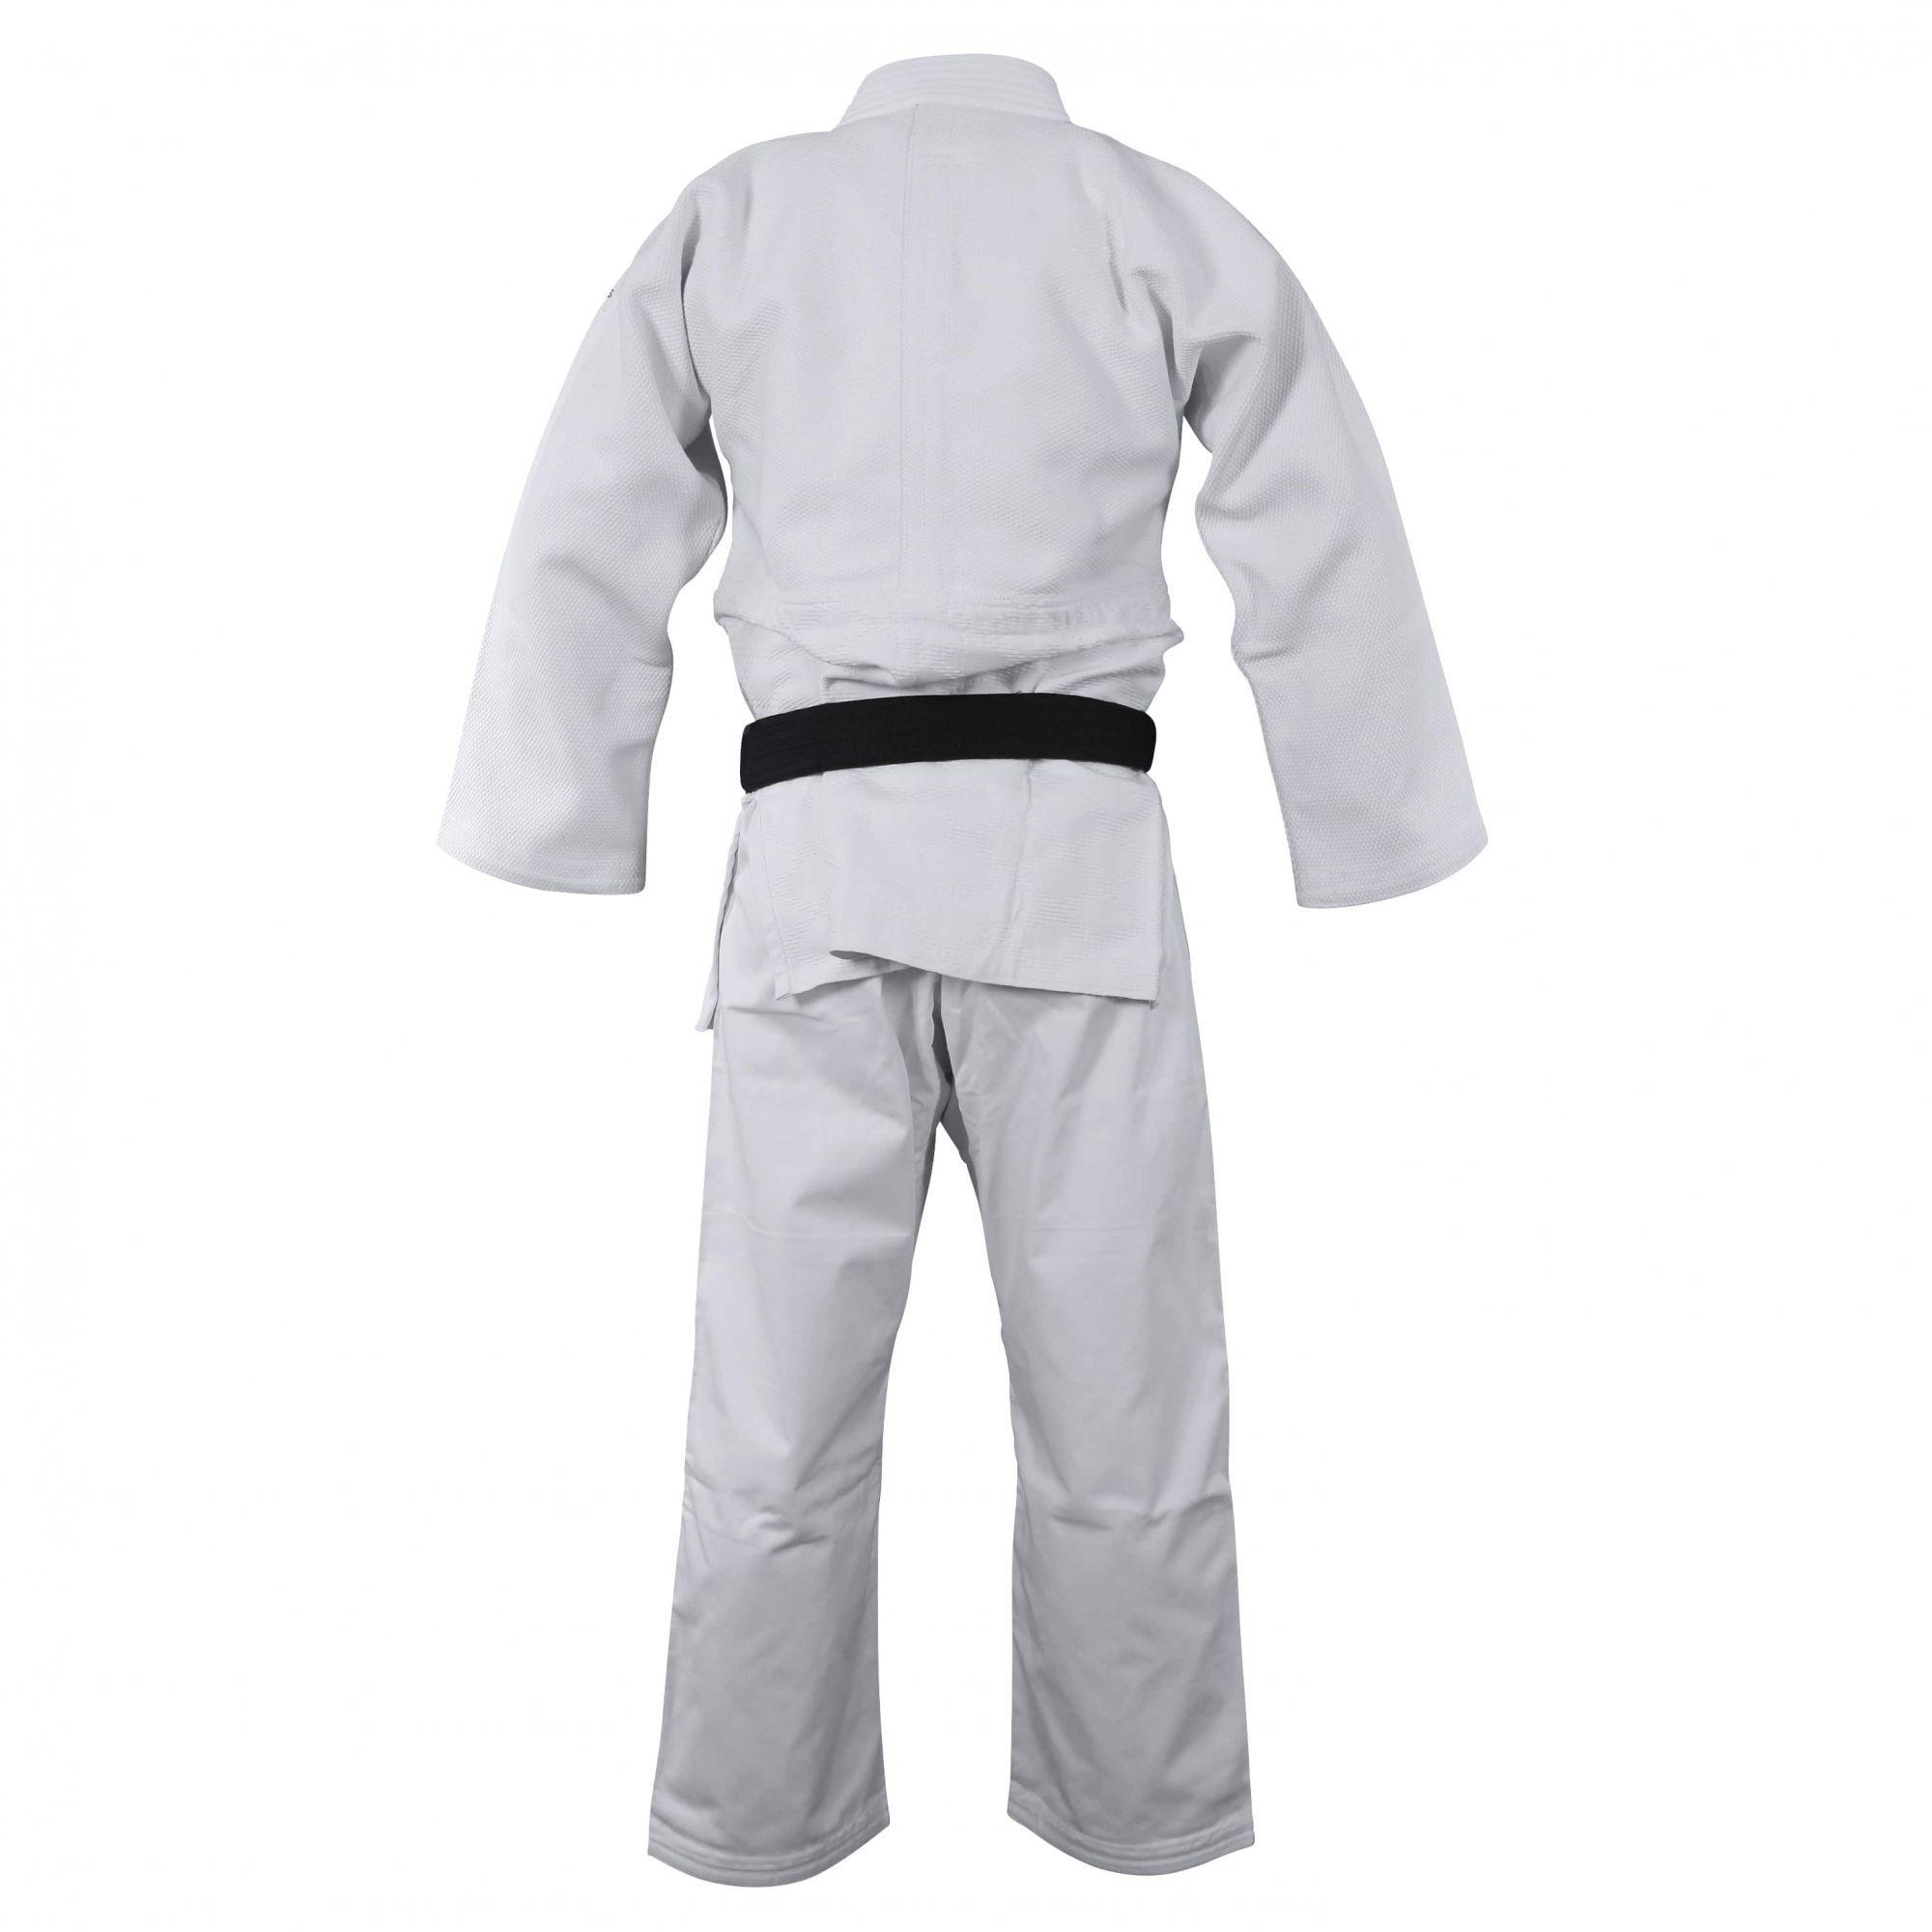 Kimono Judô adidas J990 Millenium Branco com listra Verde